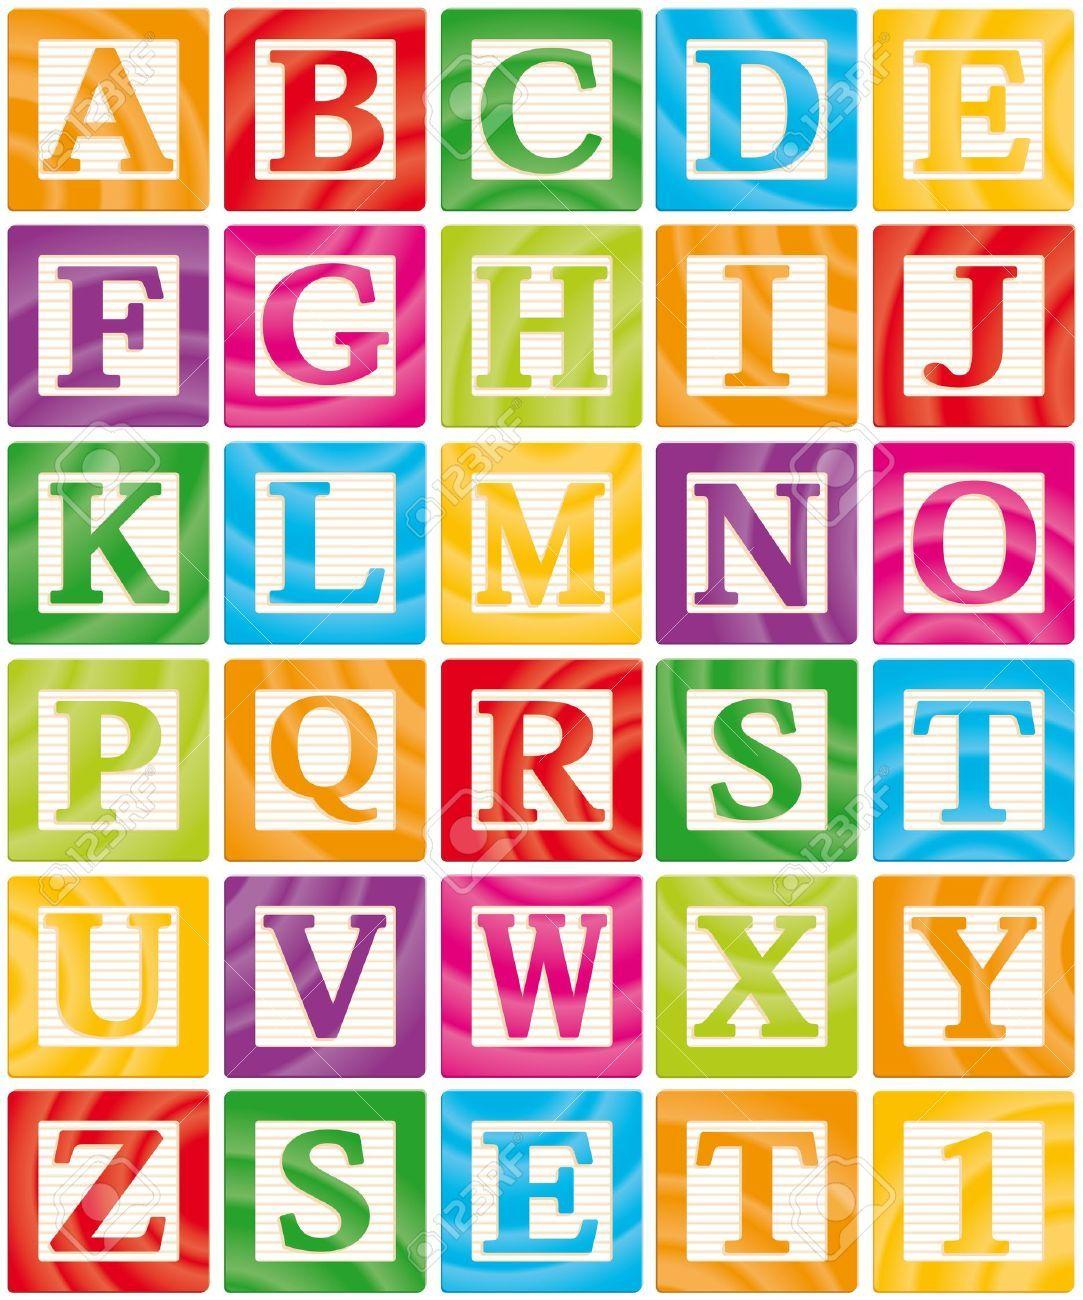 1083x1300 Infant Clipart Alphabet Block Cute Borders, Vectors, Animated